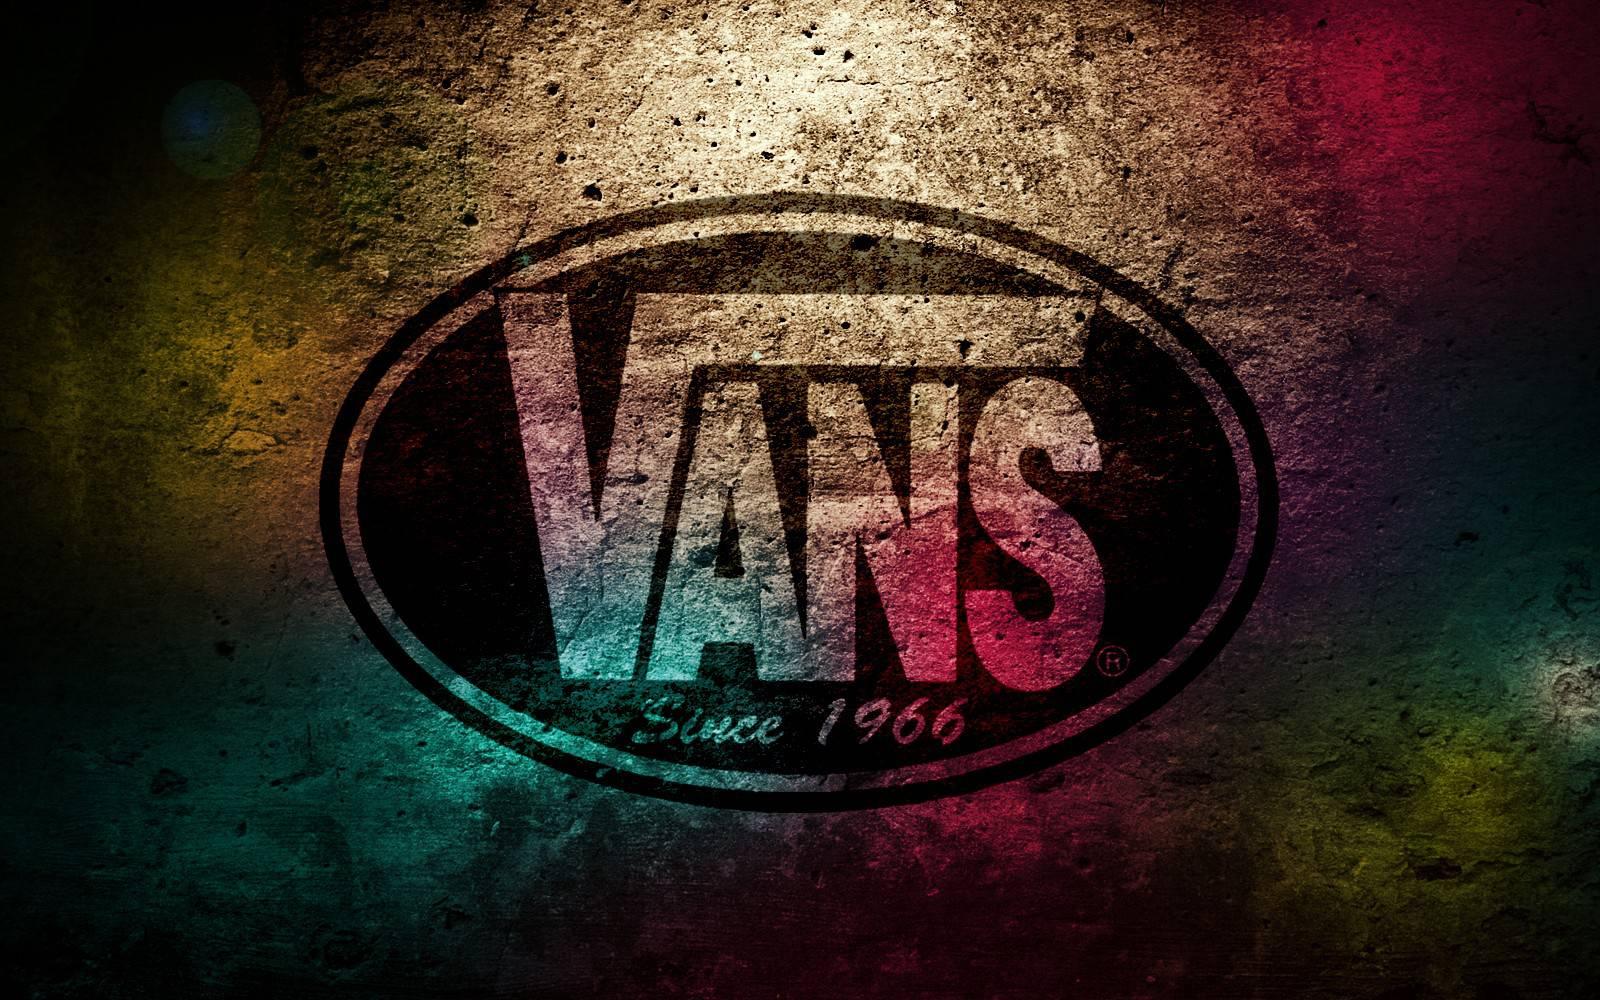 Vans logo wallpapers wallpaper cave - Cool logo wallpapers ...